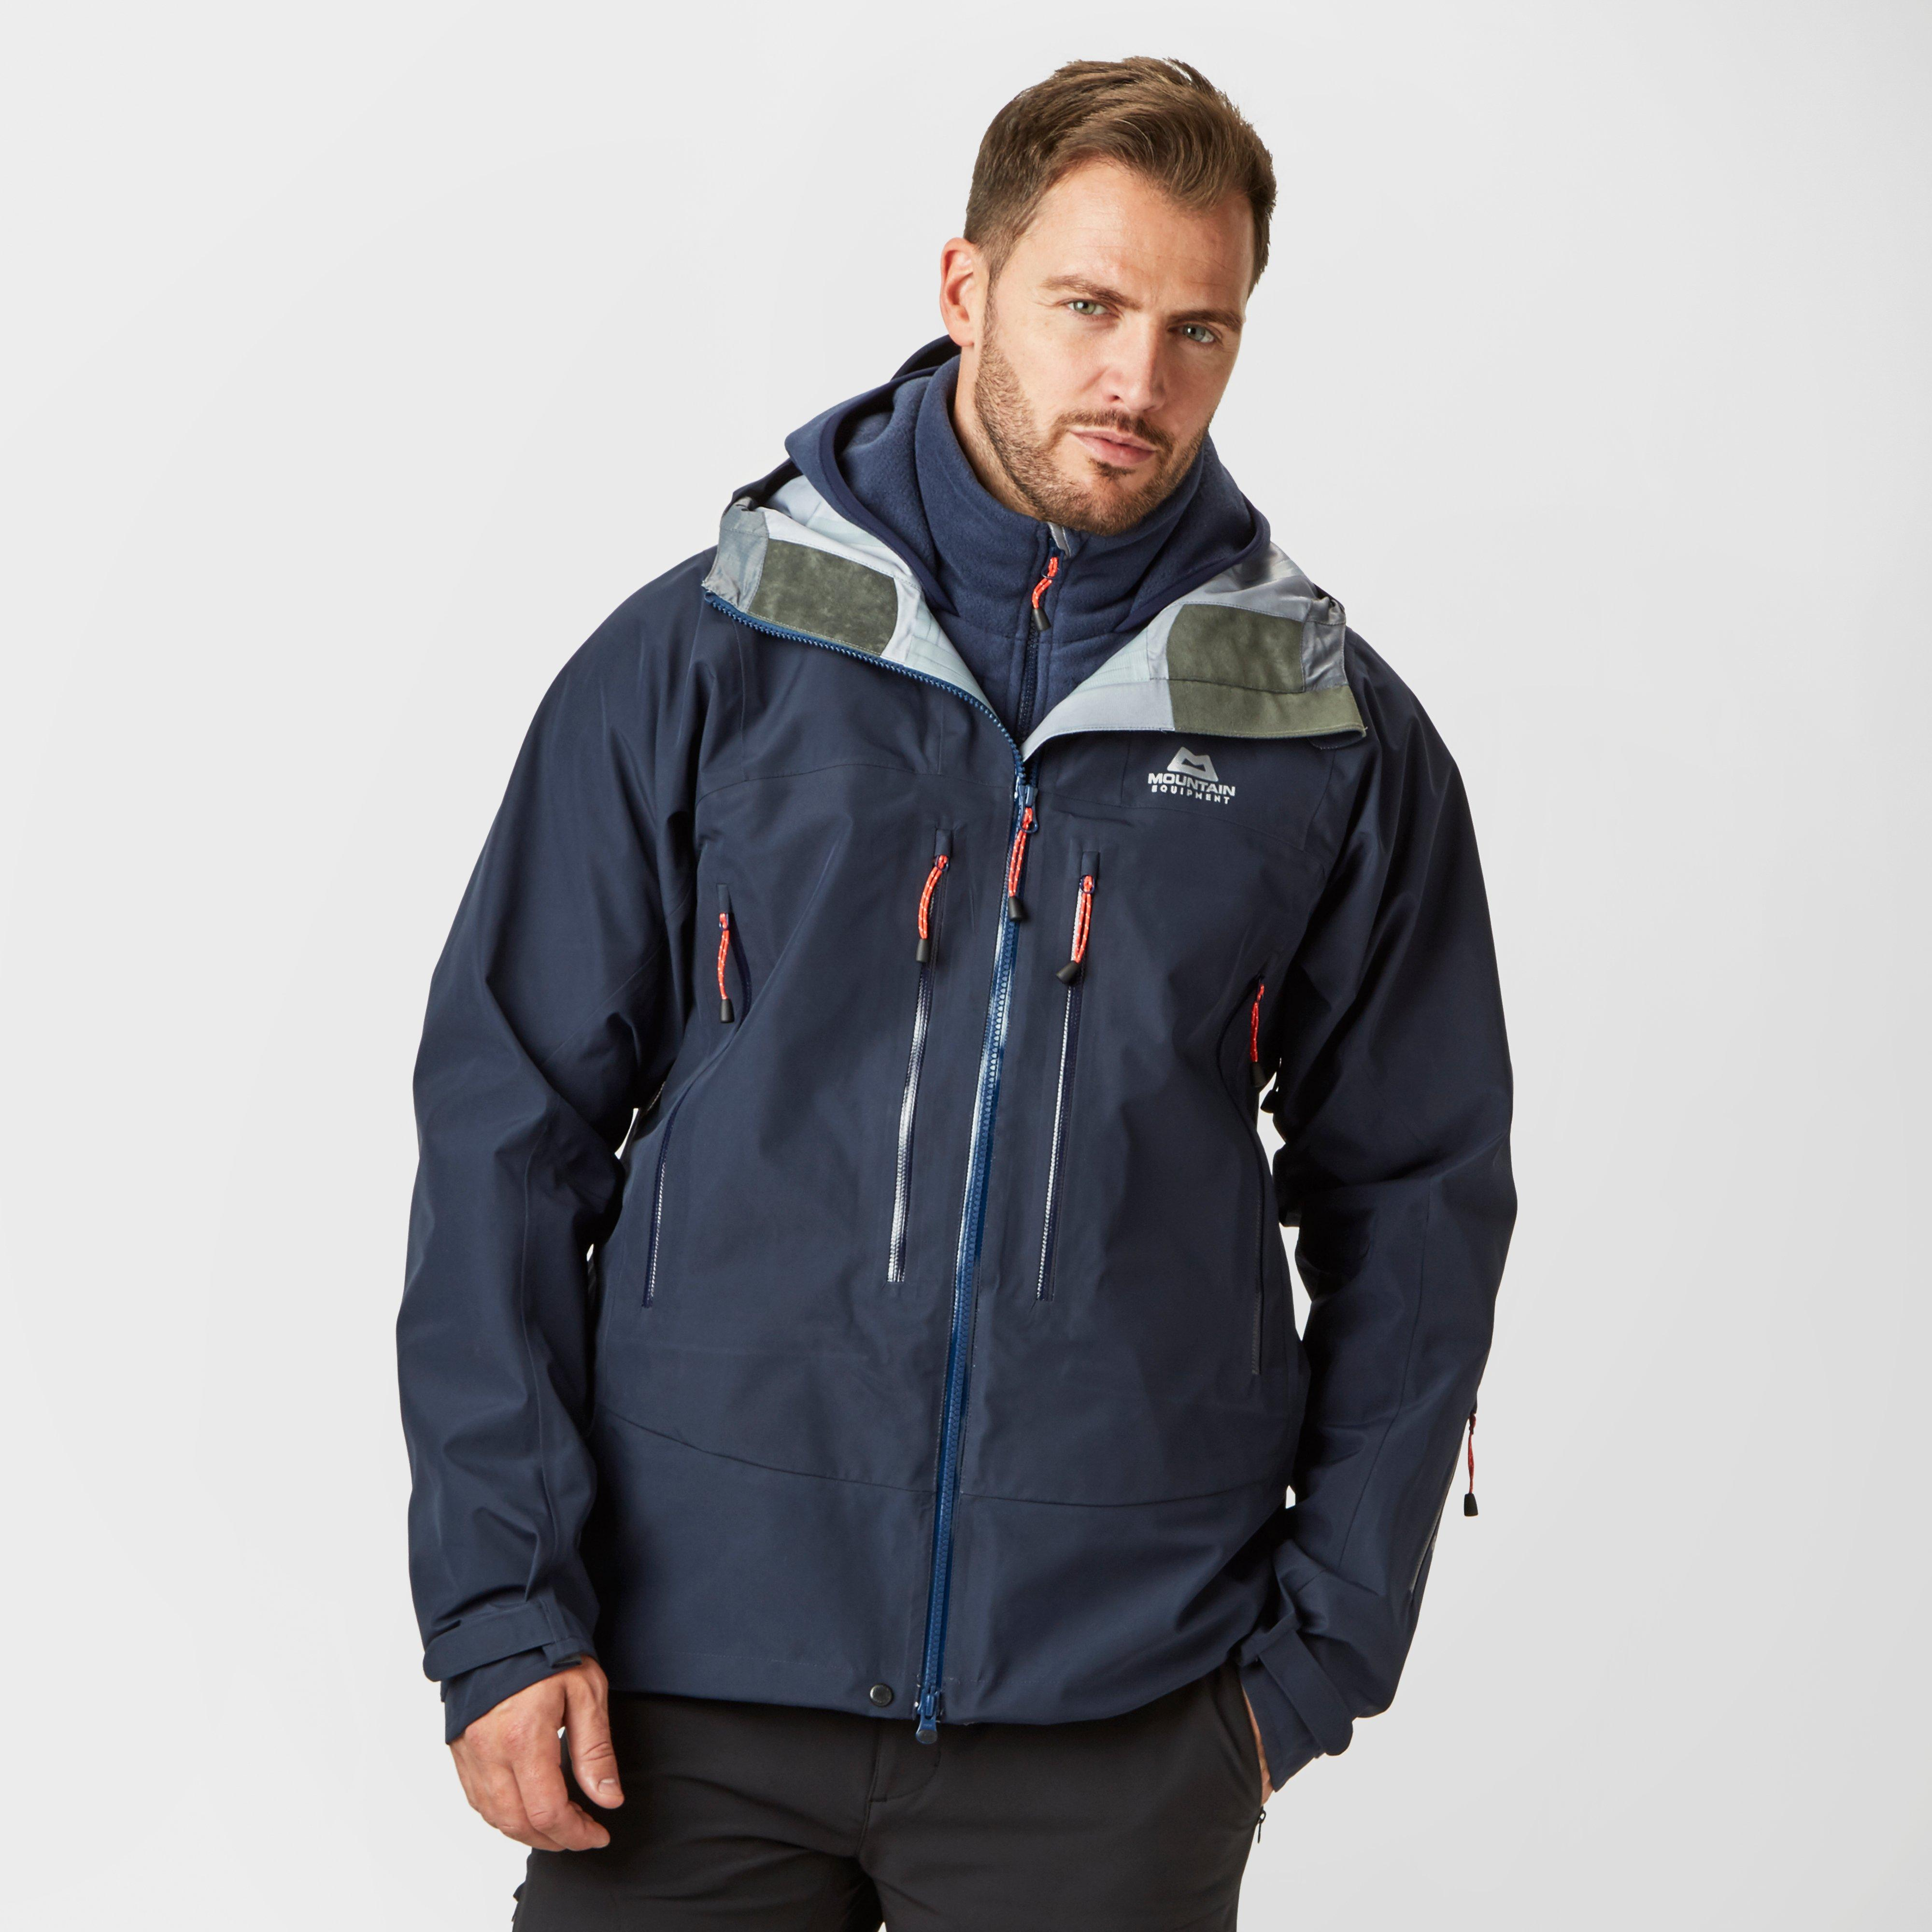 MOUNTAIN EQUIPMENT Men's Kangshung GORE-TEX® Jacket